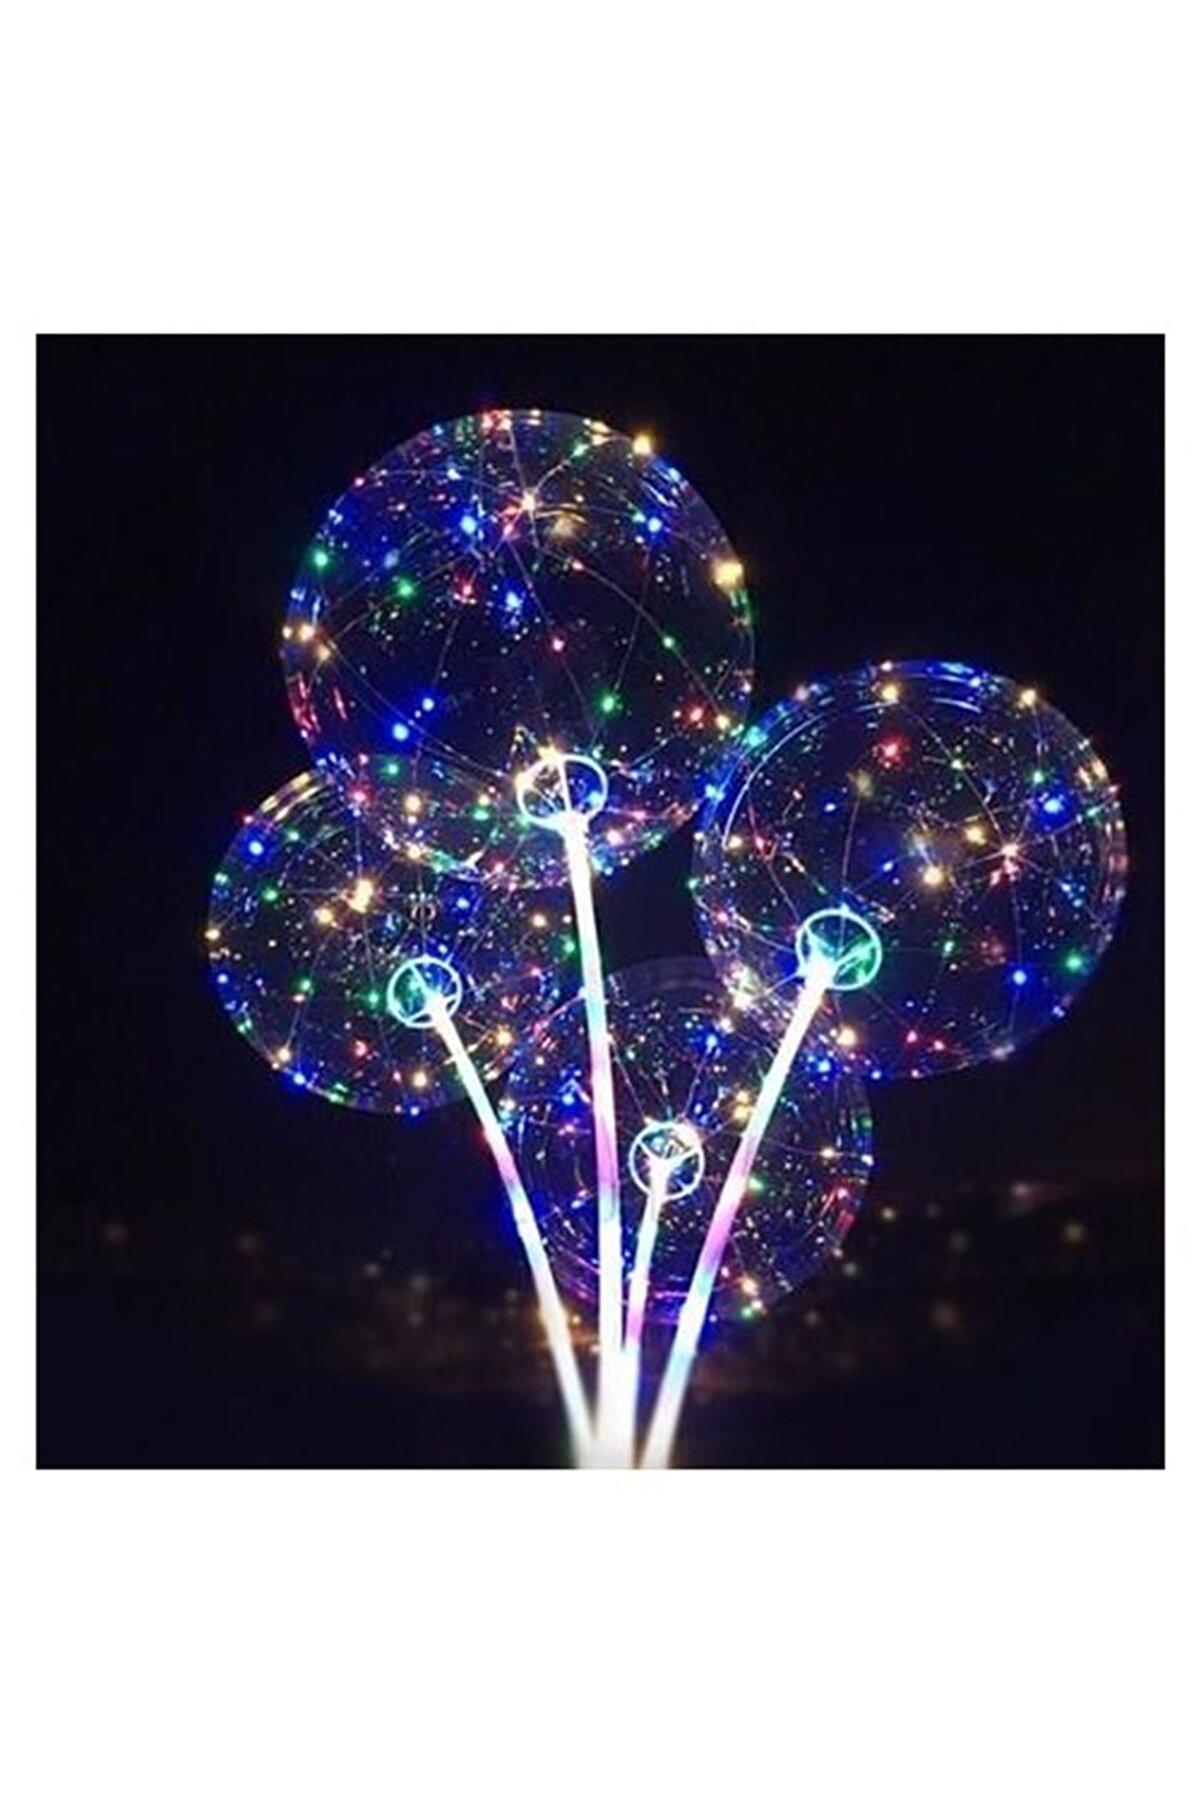 Parti Dolabı 1 Adet Ledli Işıklı Balon, Düğmeli Çubuklu Balon Set